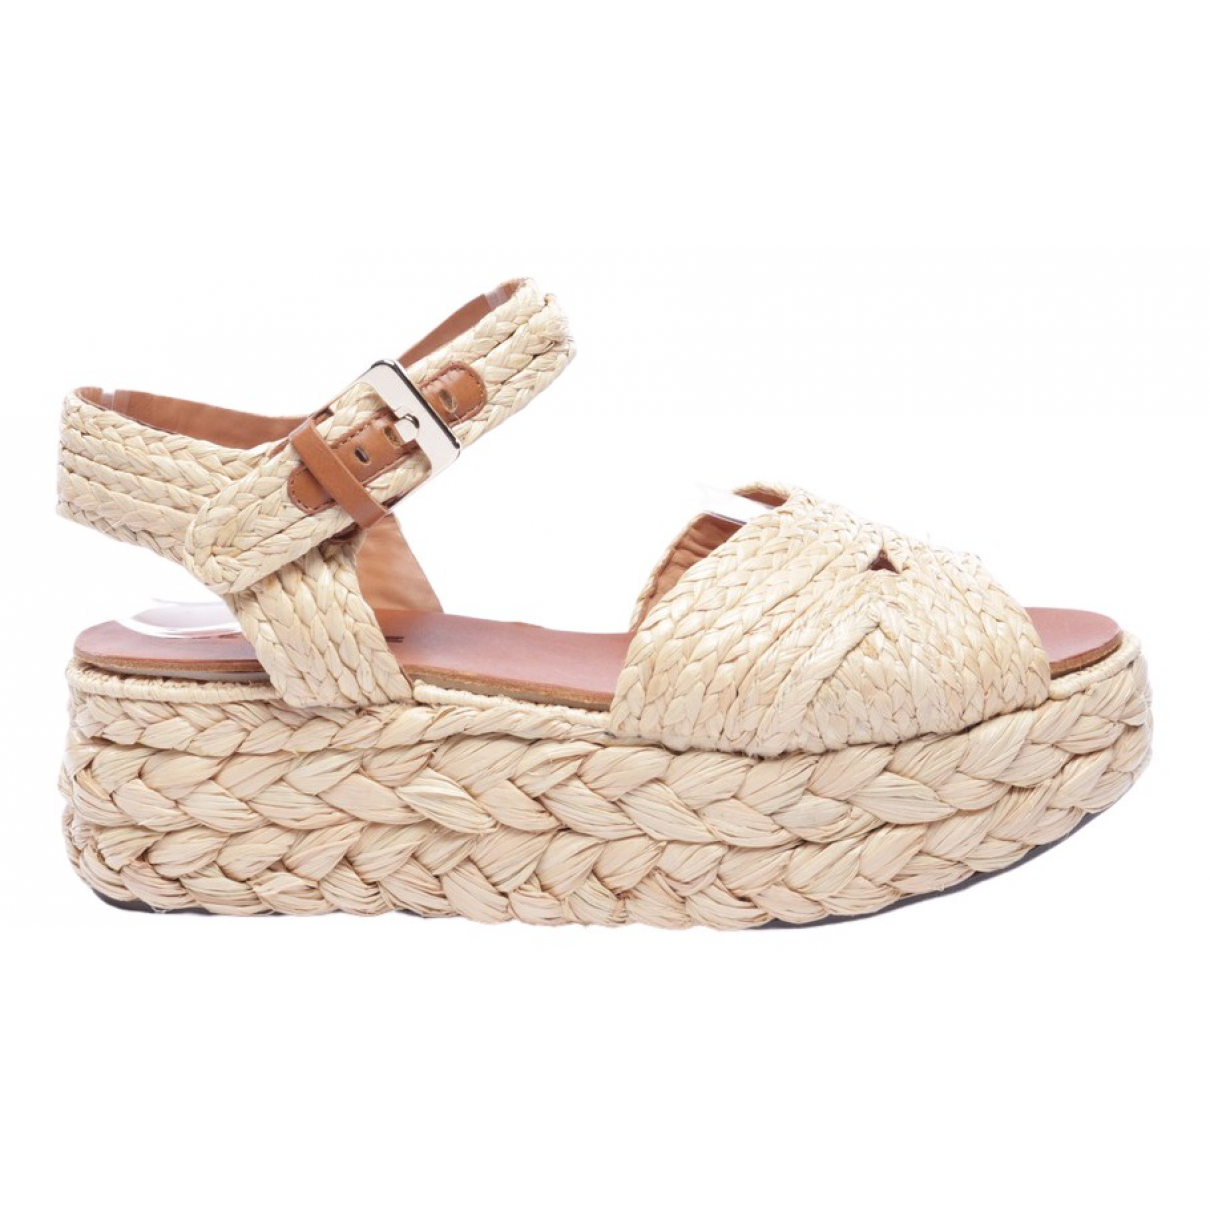 Robert Clergerie \N Beige Leather Sandals for Women 37.5 EU